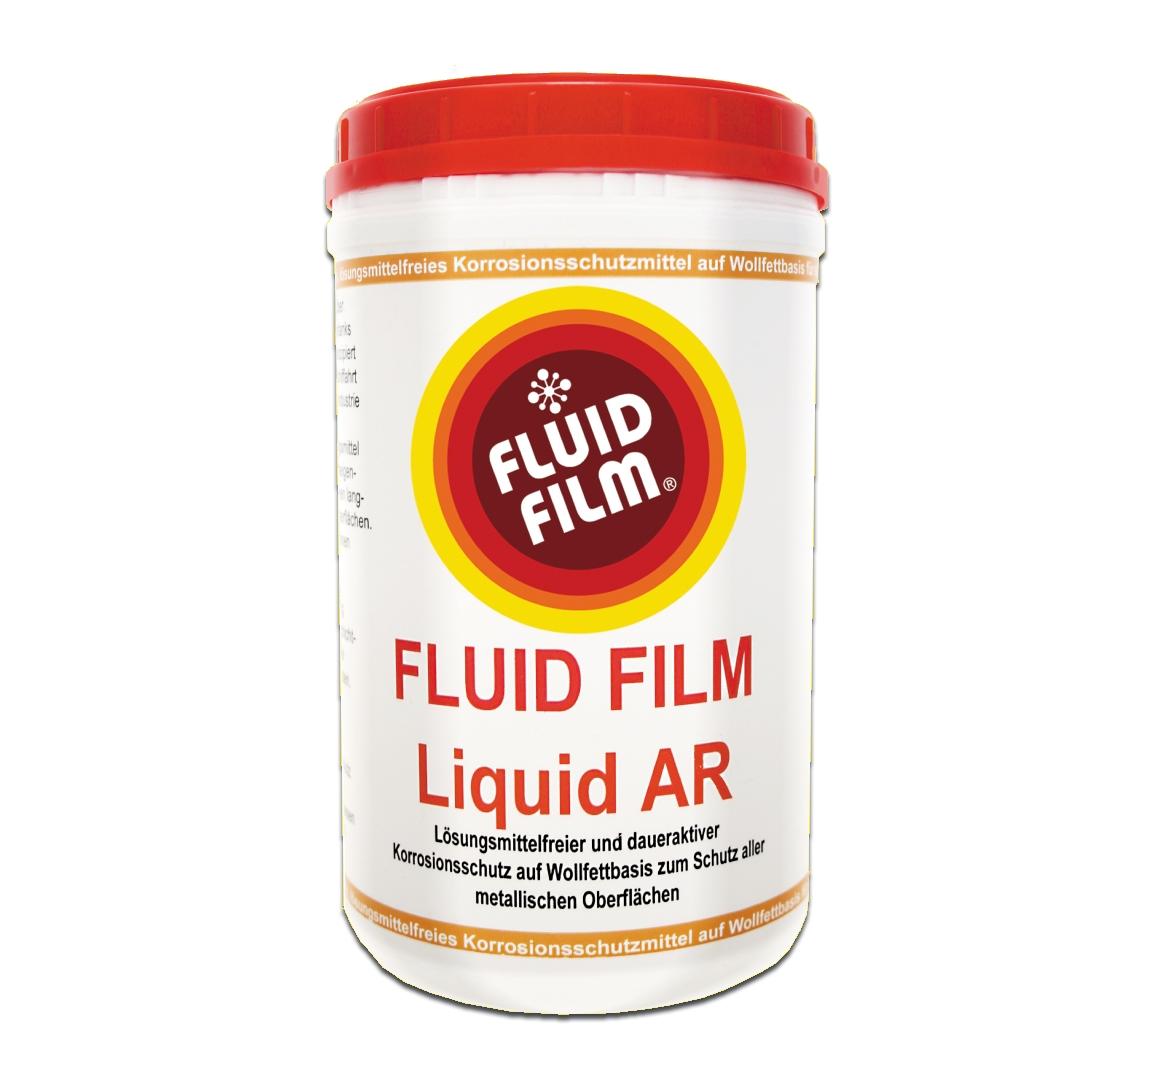 Fluid Film Liquid AR